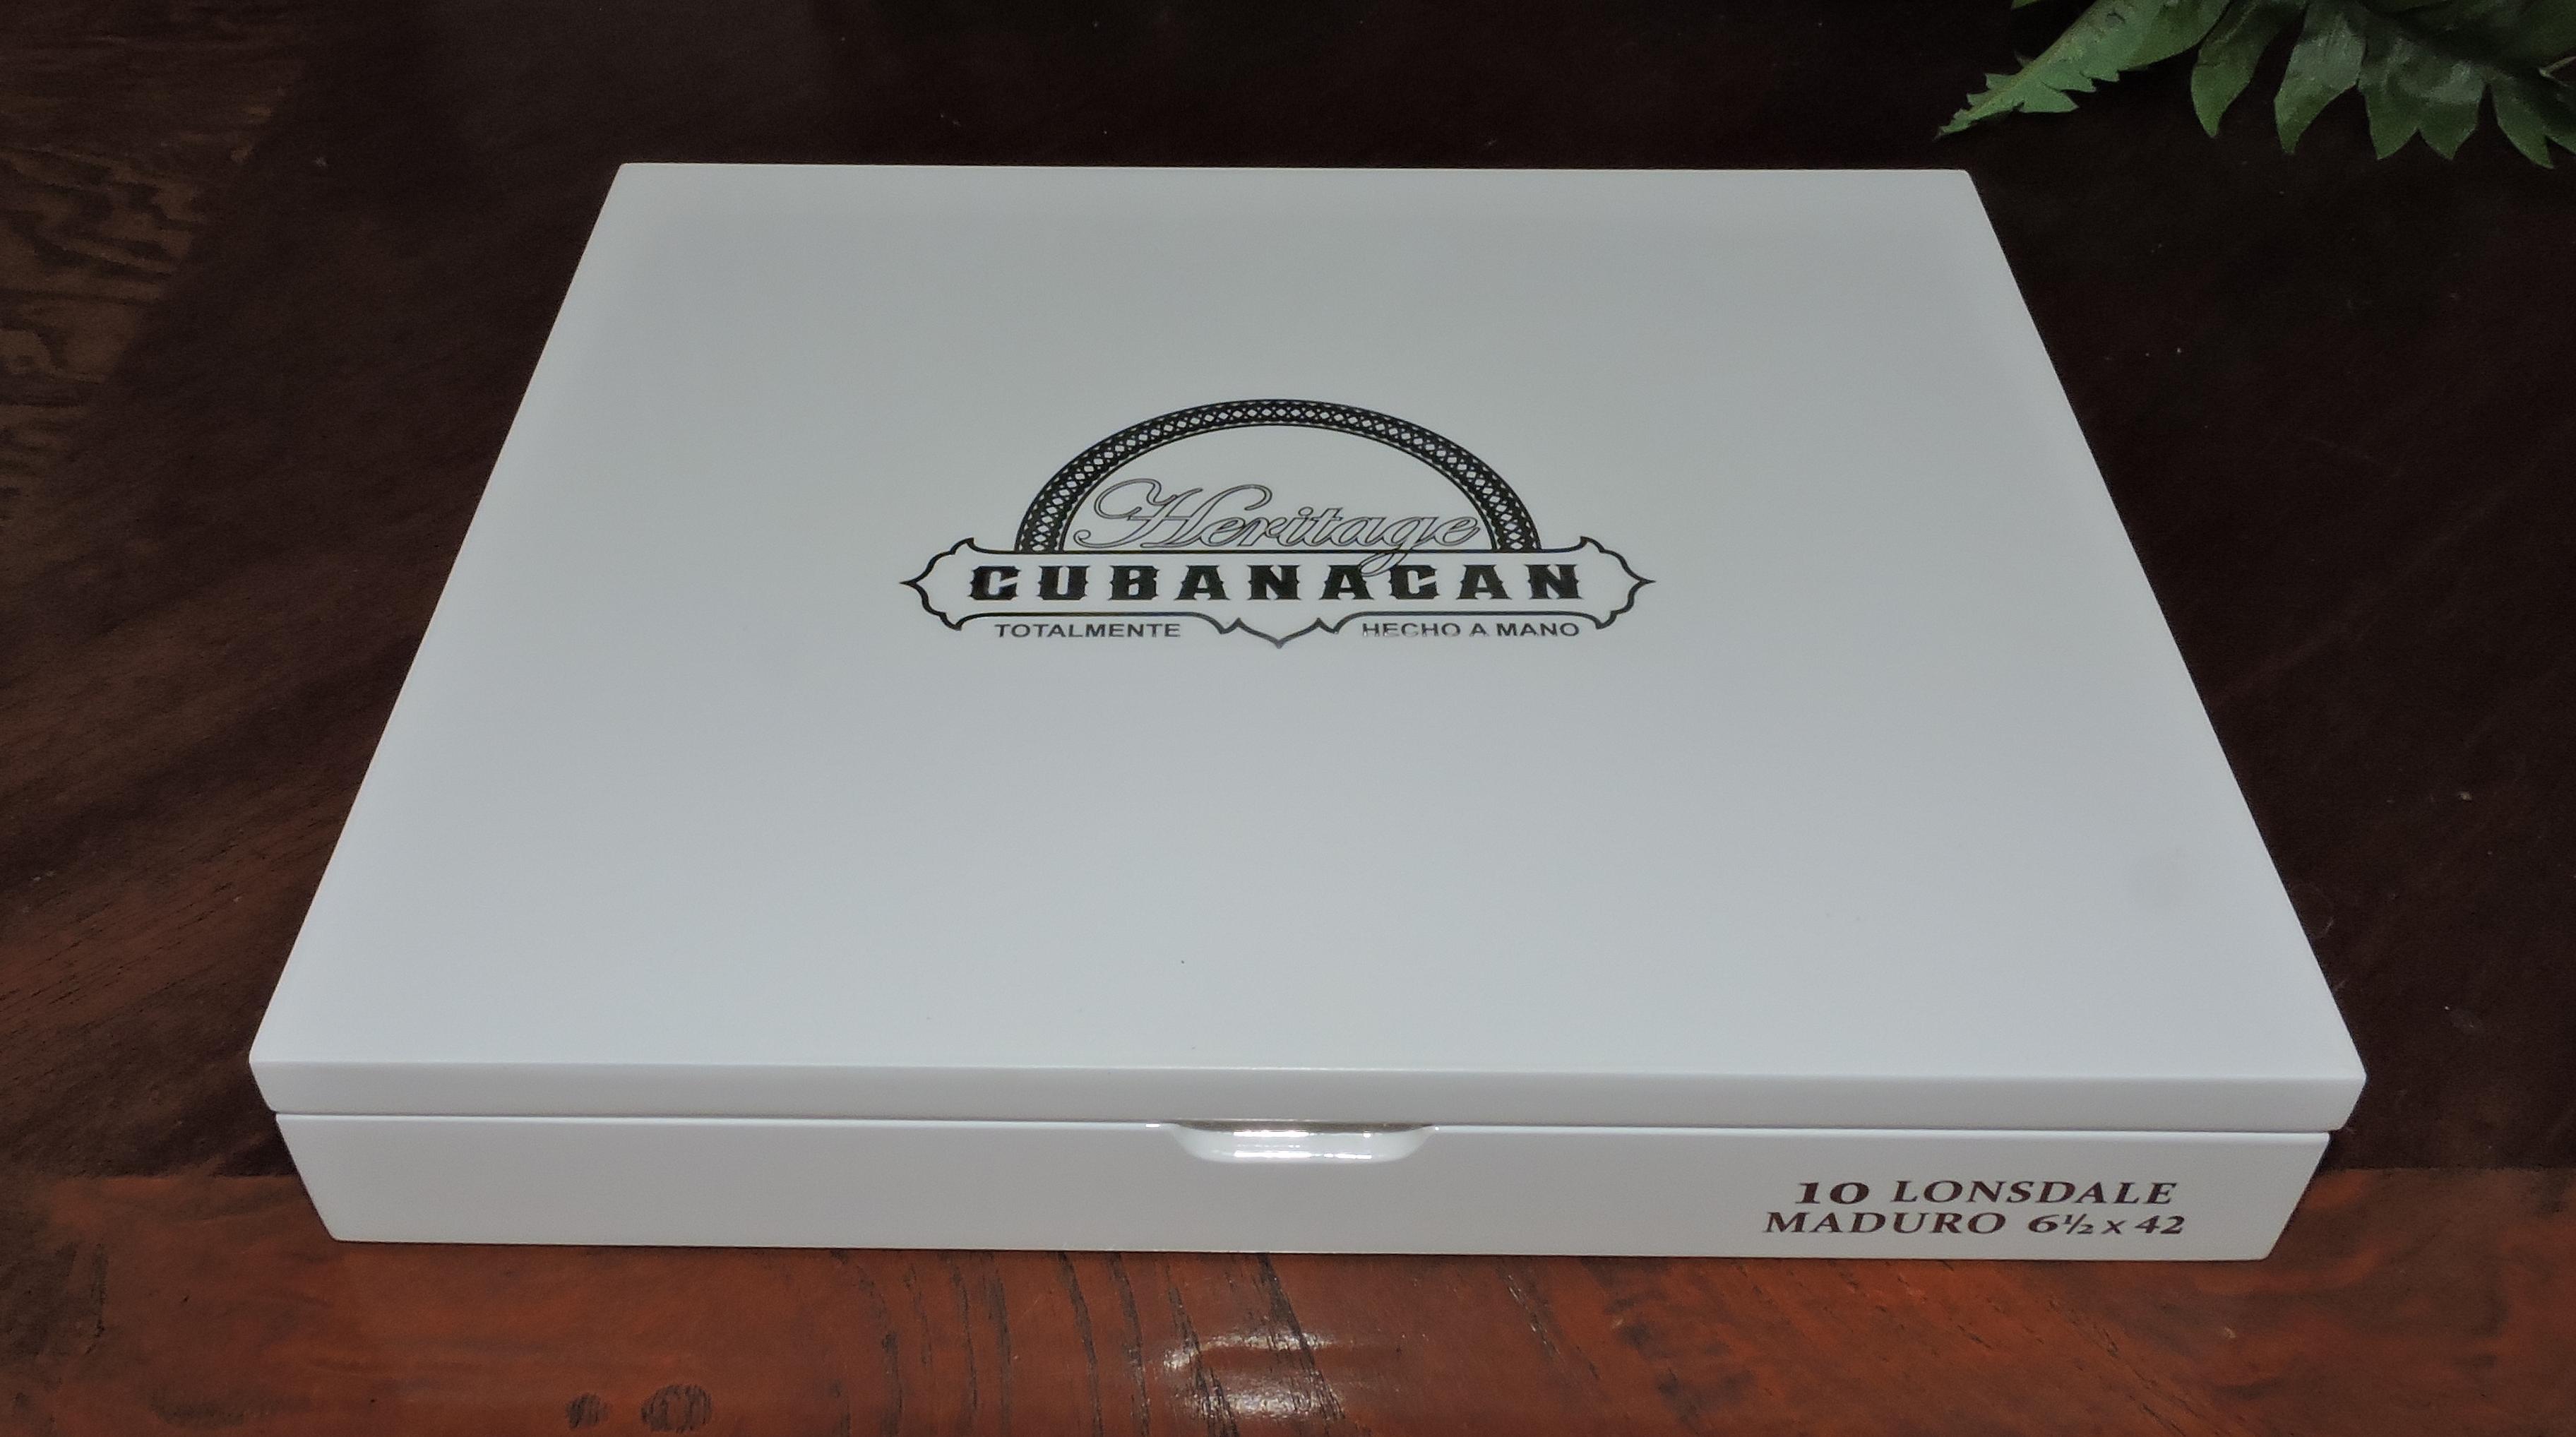 Cubanacan Maduro Lonsdale Box